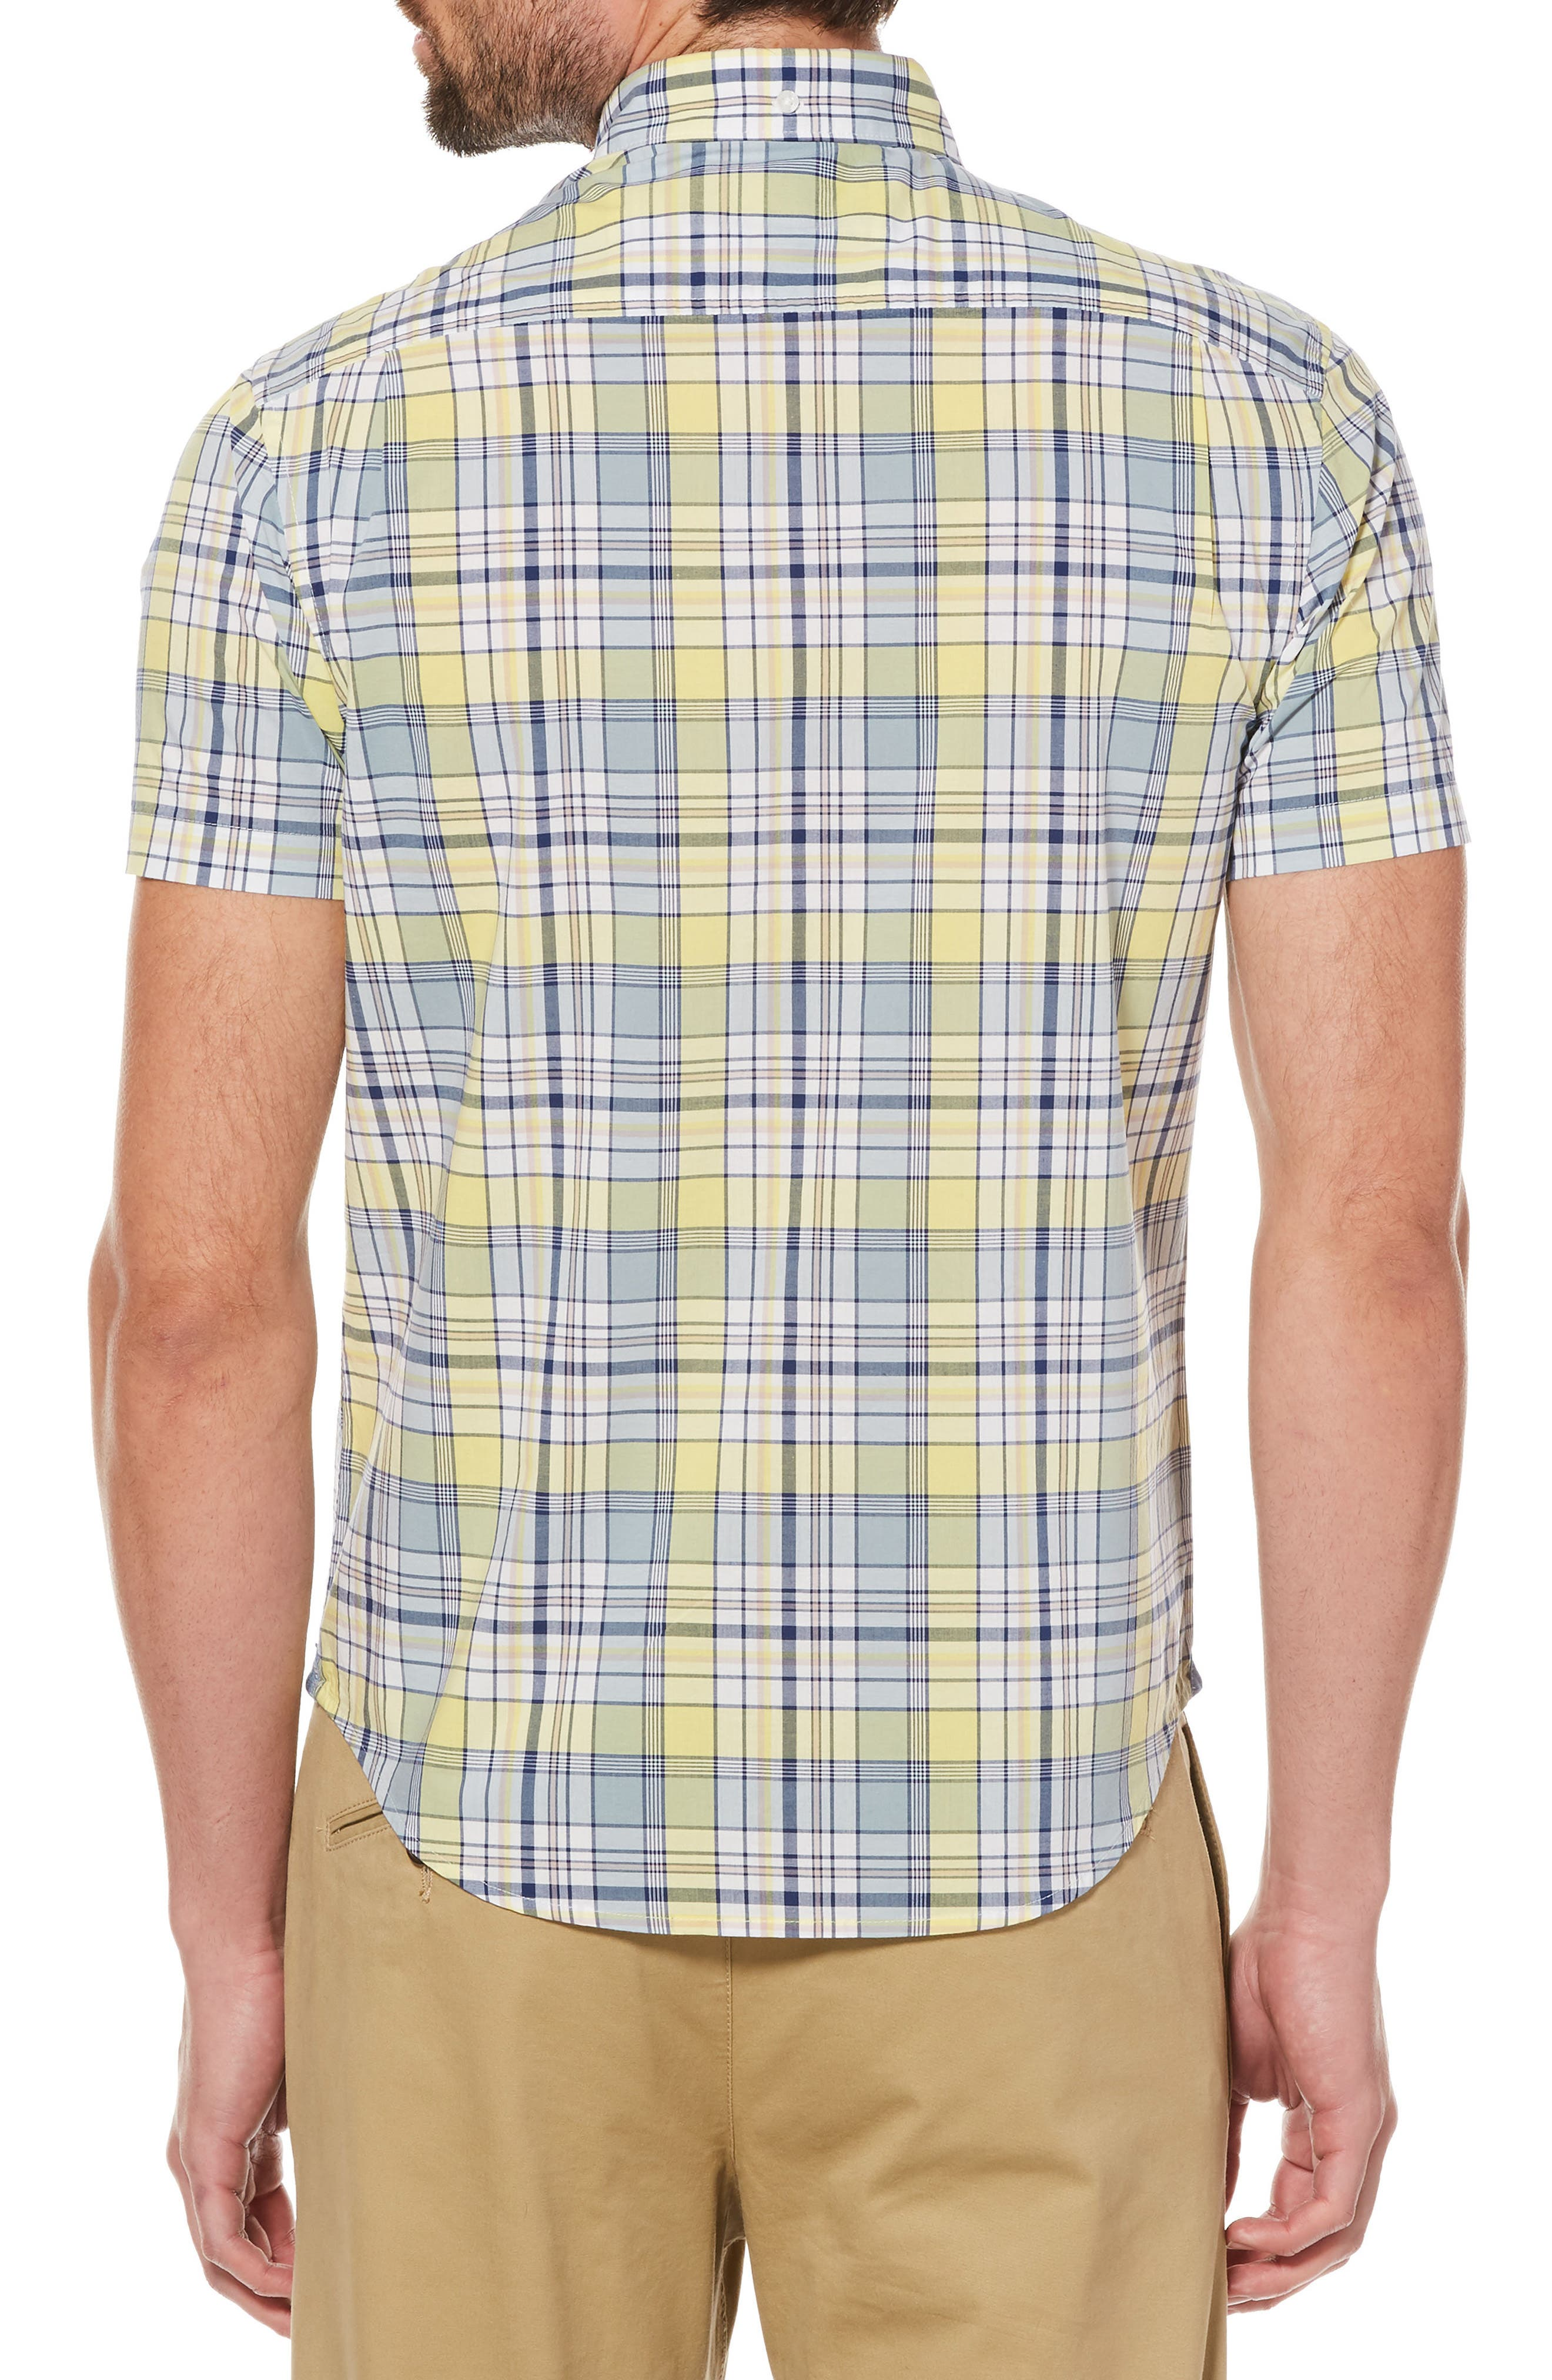 P55 Woven Shirt,                             Alternate thumbnail 2, color,                             751